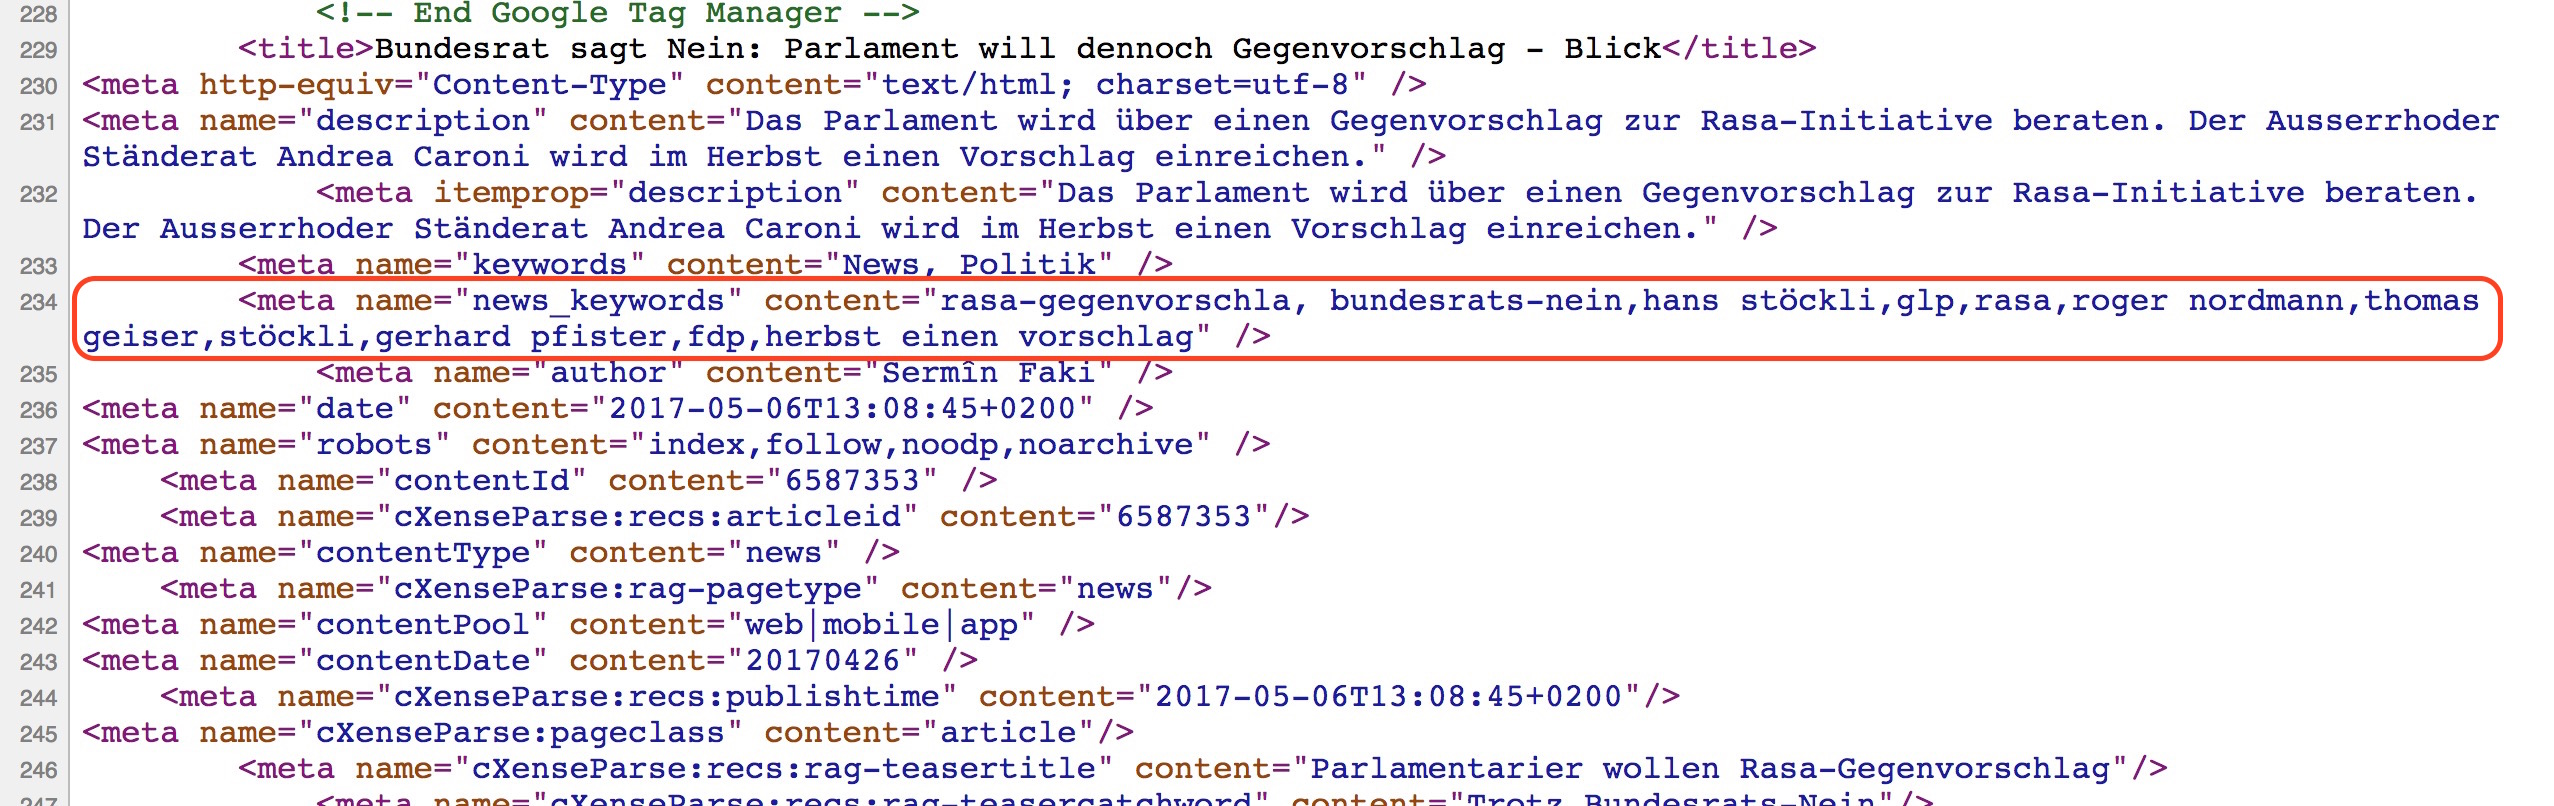 Screenshot eines meta news keyword tag auf blick.ch